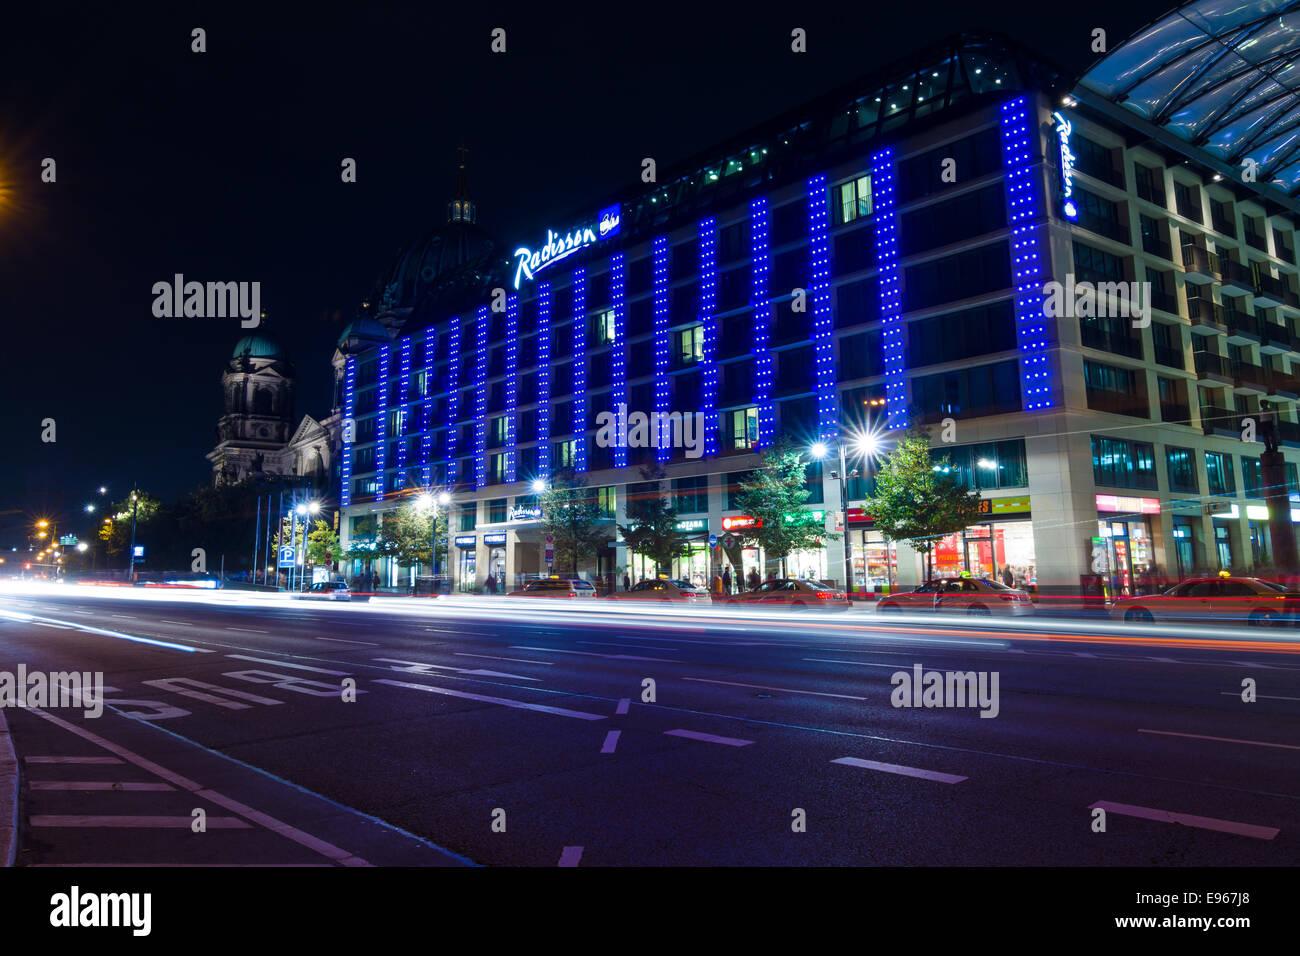 The five-star Radisson Blu hotel in the original illumination. The annual Festival of Lights 2014 - Stock Image